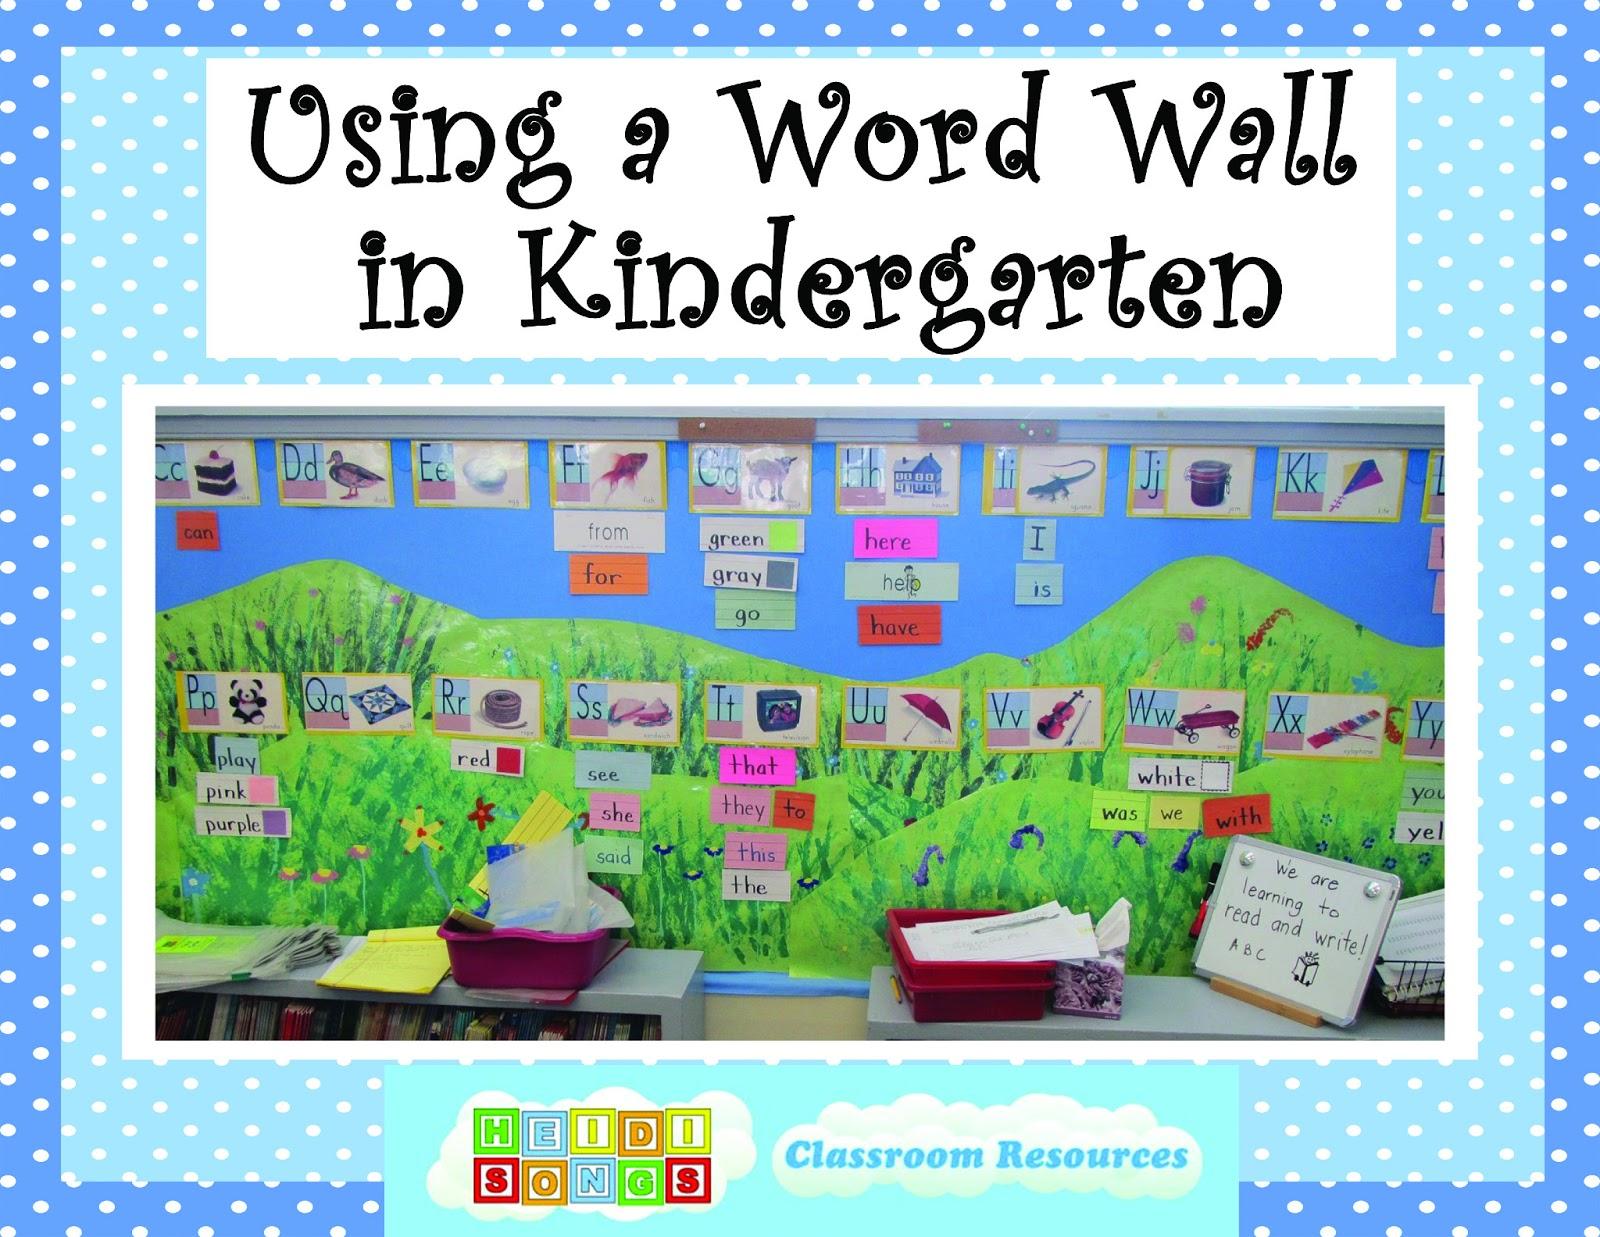 Word Wall Ideas For Preschool : Using a word wall in kindergarten heidi songs